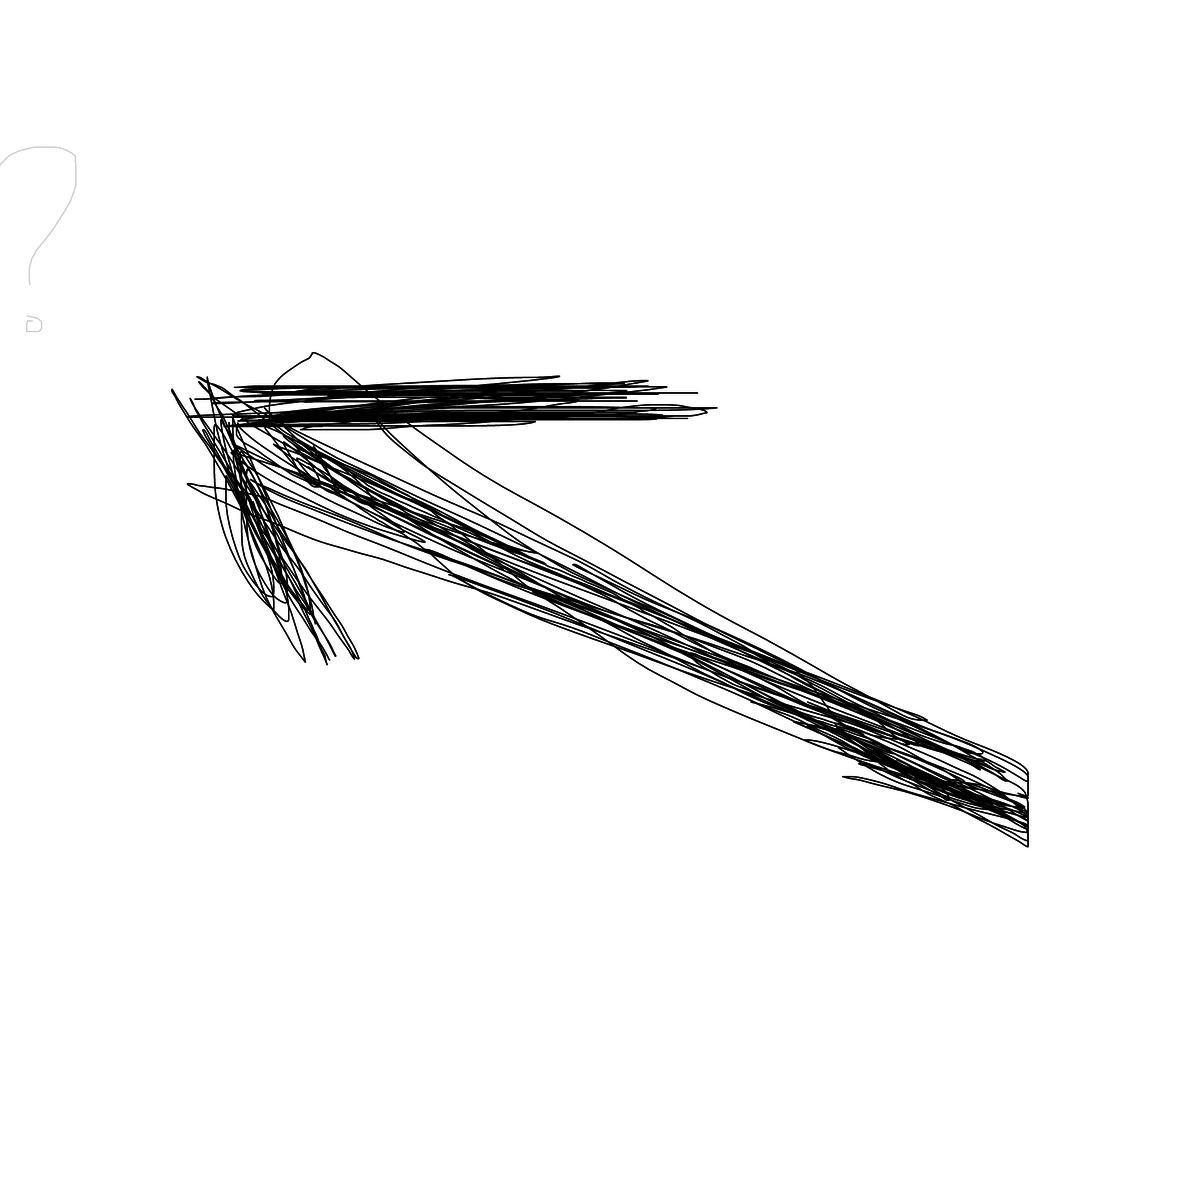 BAAAM drawing#11966 lat:52.4764060974121100lng: 13.4059925079345700